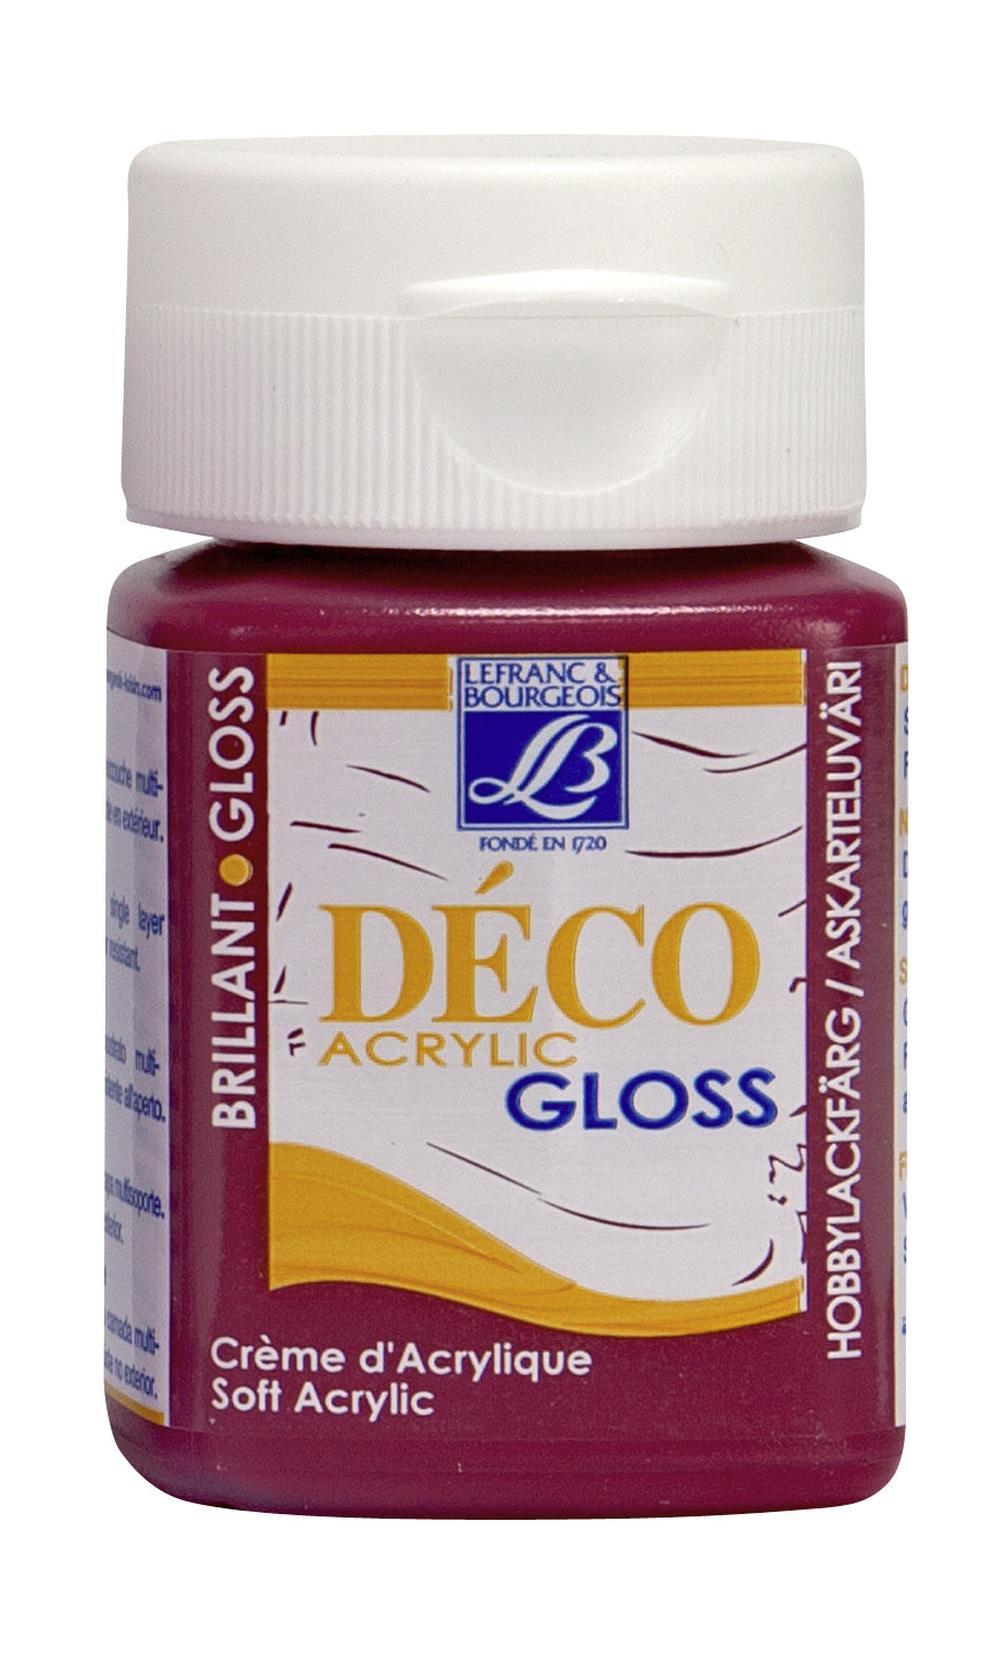 Hobbyfärg L&B Deco Gloss Akryl 50ml  Carmine 327 (4F) Utgår